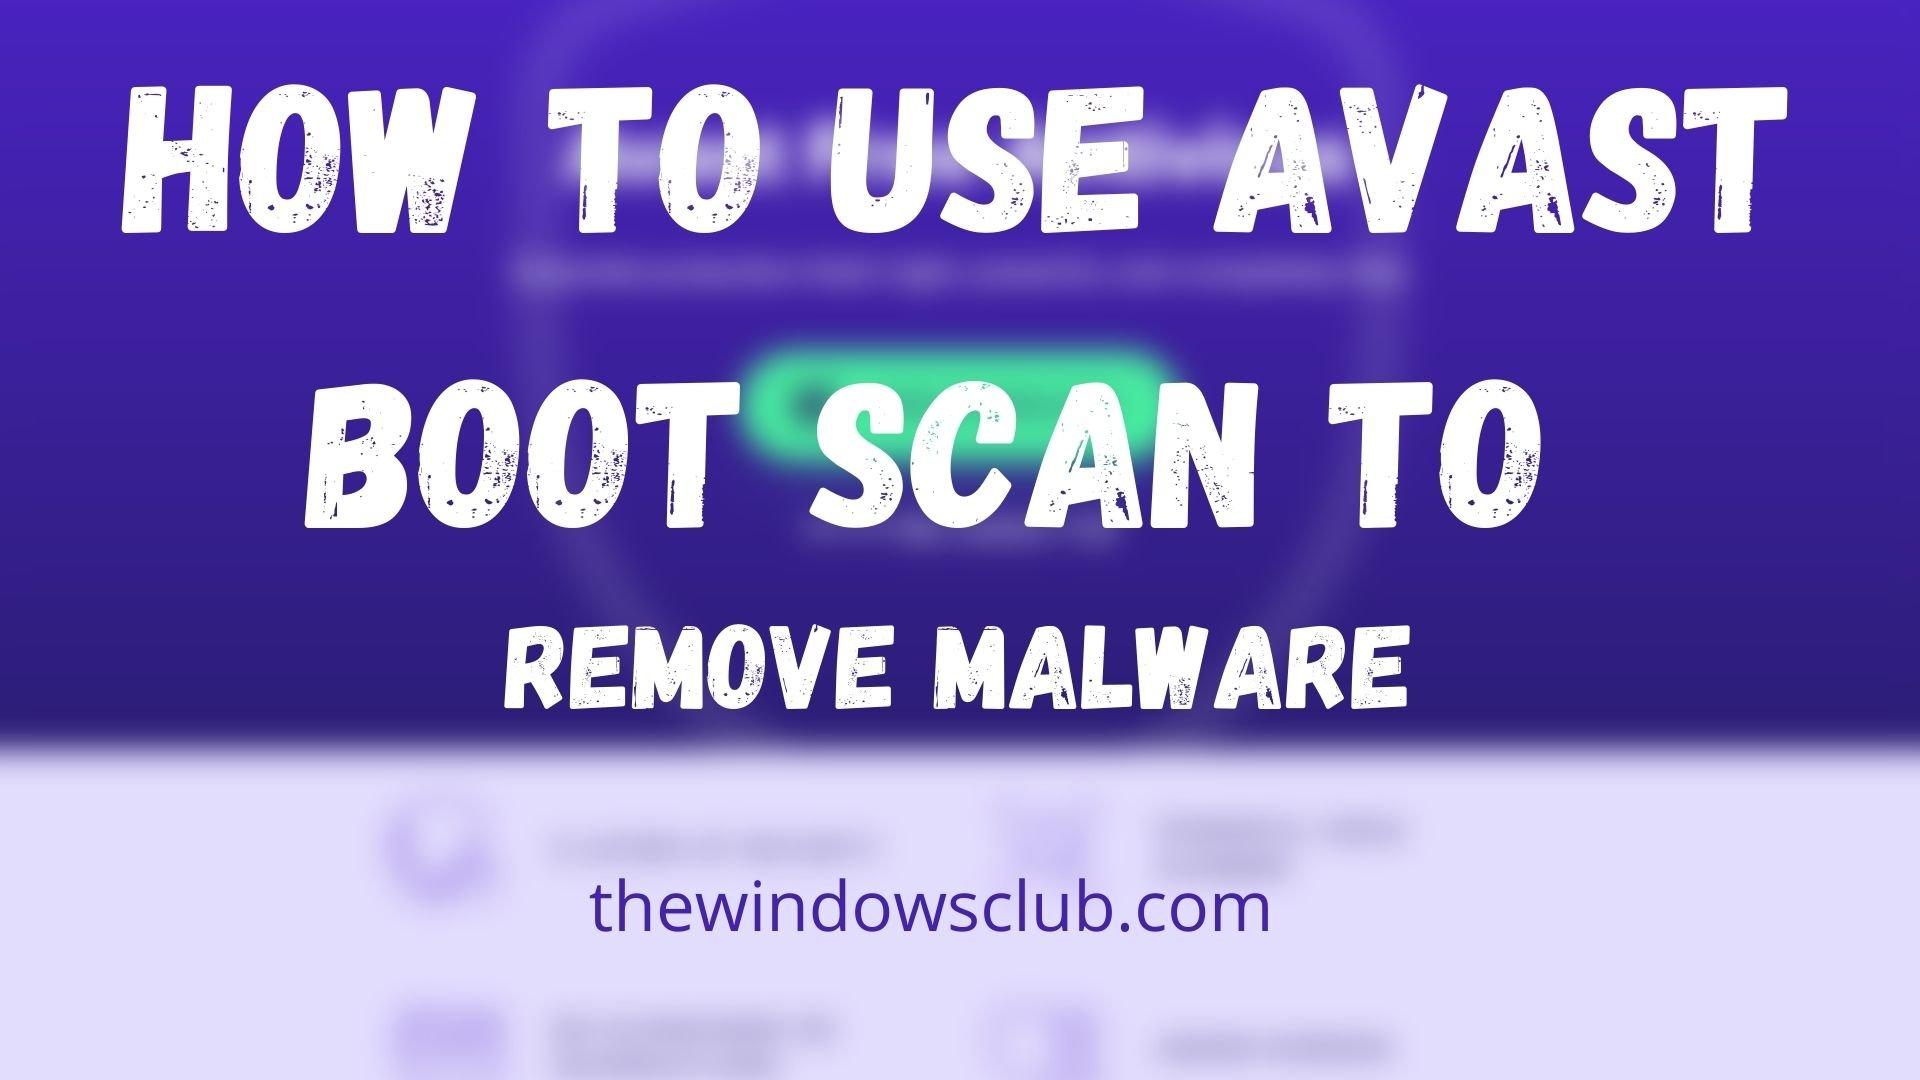 Avast Boot Scan Malware